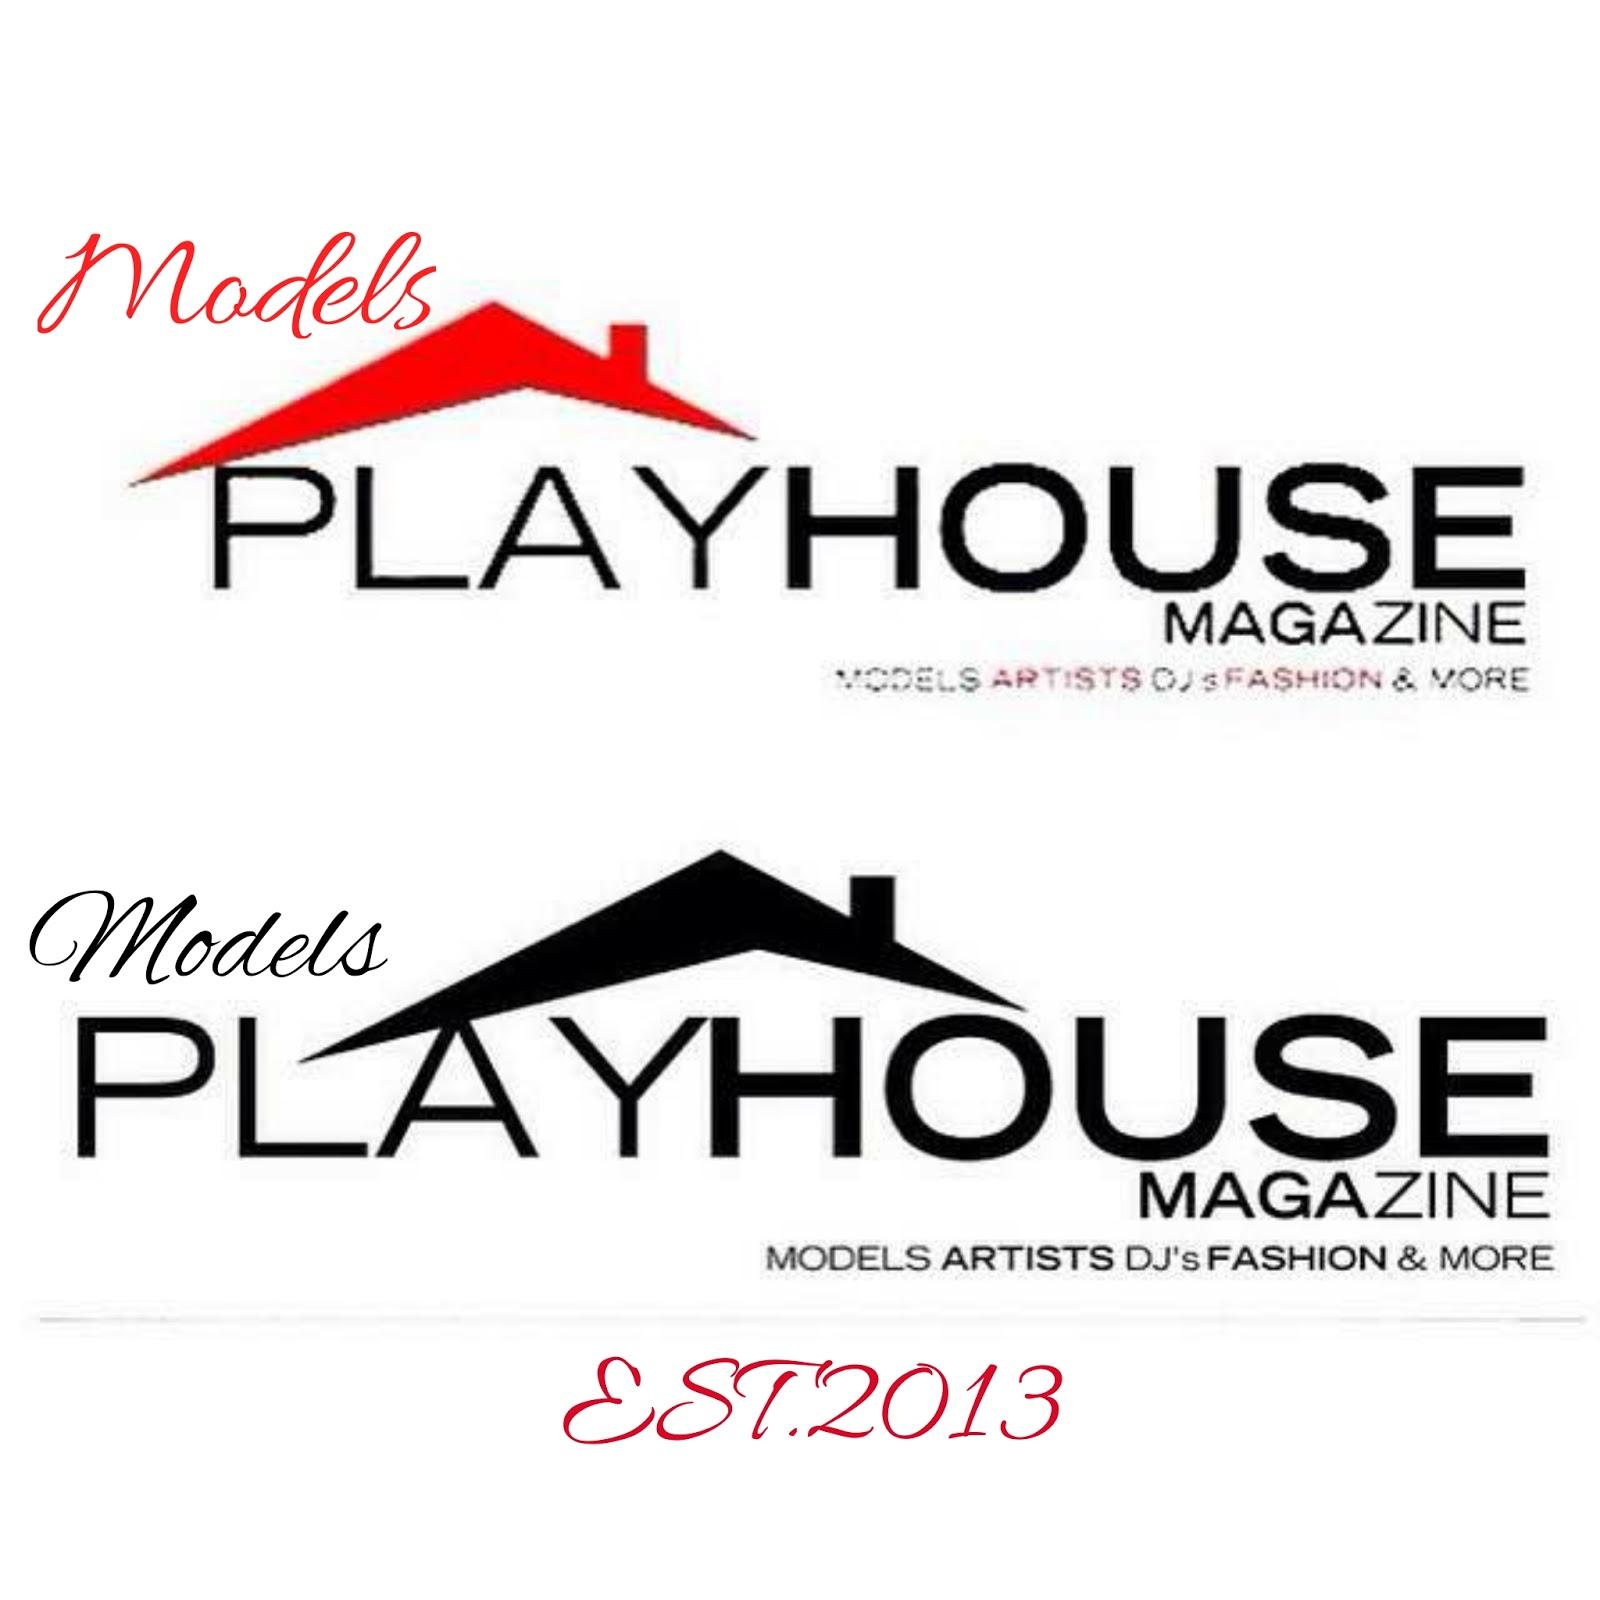 Models Playhouse Magazine